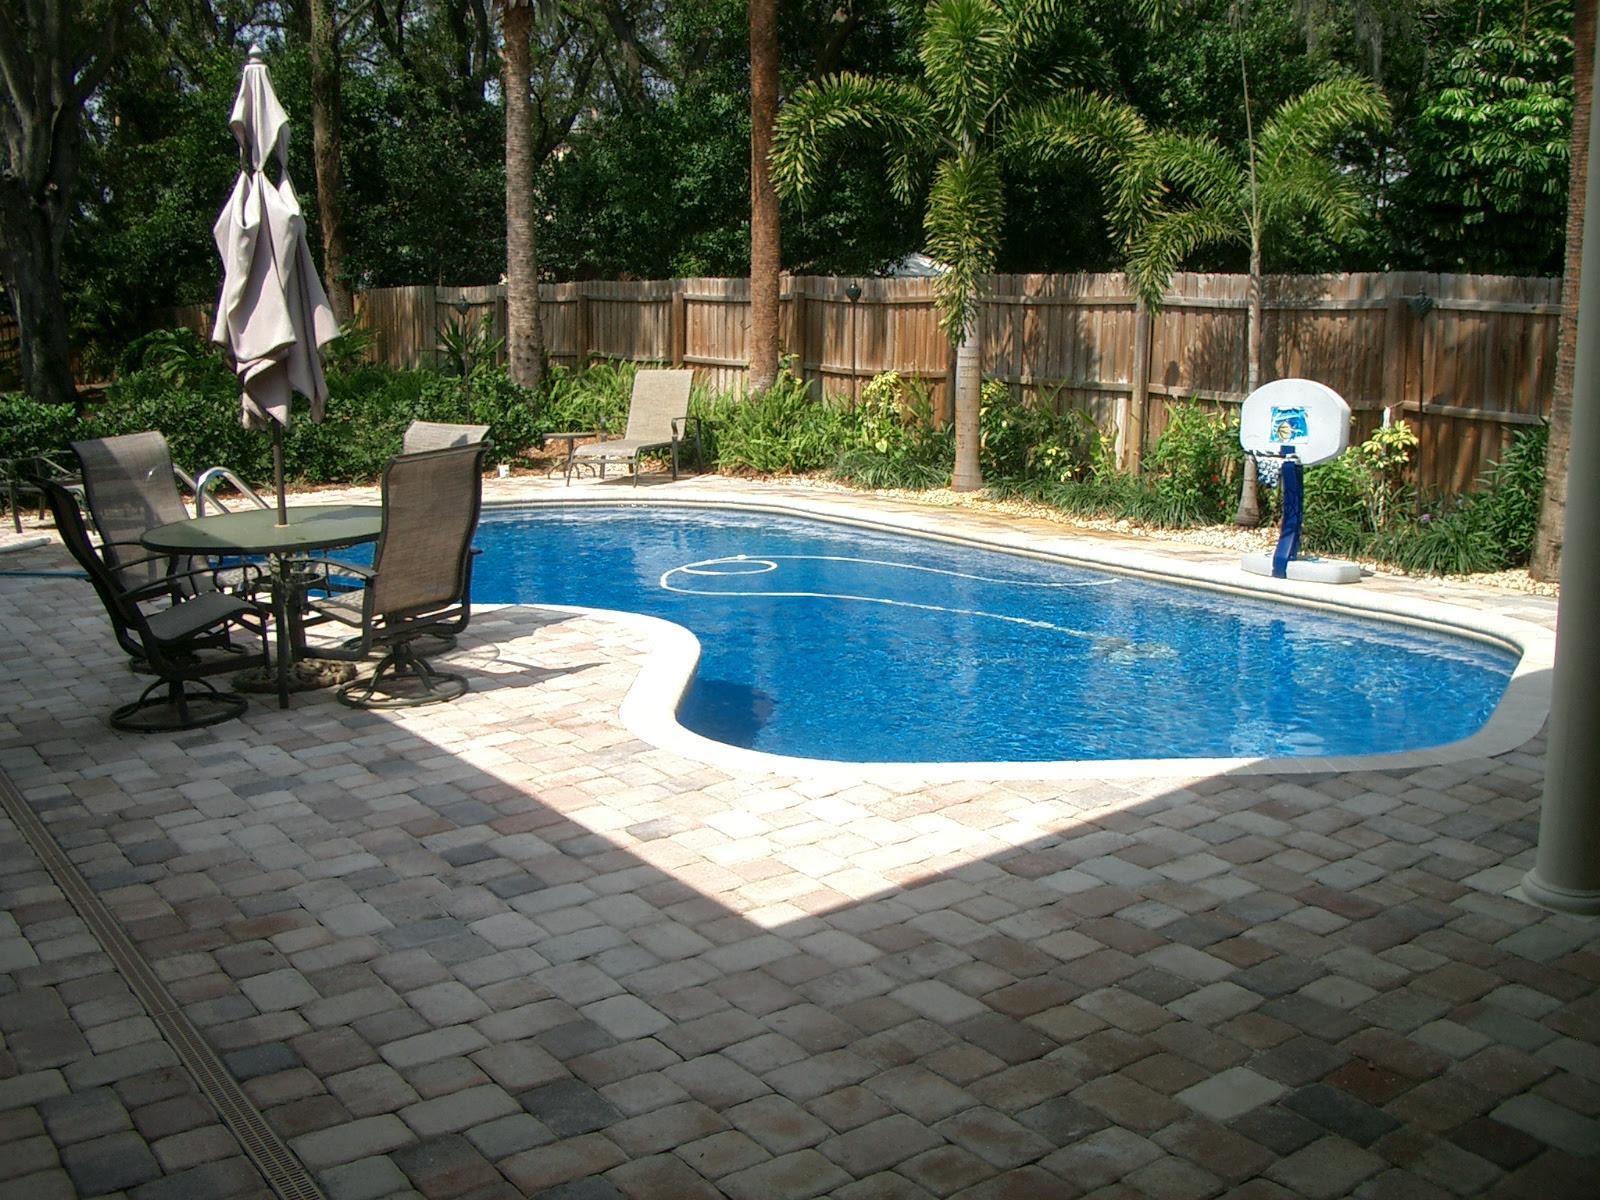 35 Best Backyard Pool Ideas – The WoW Style